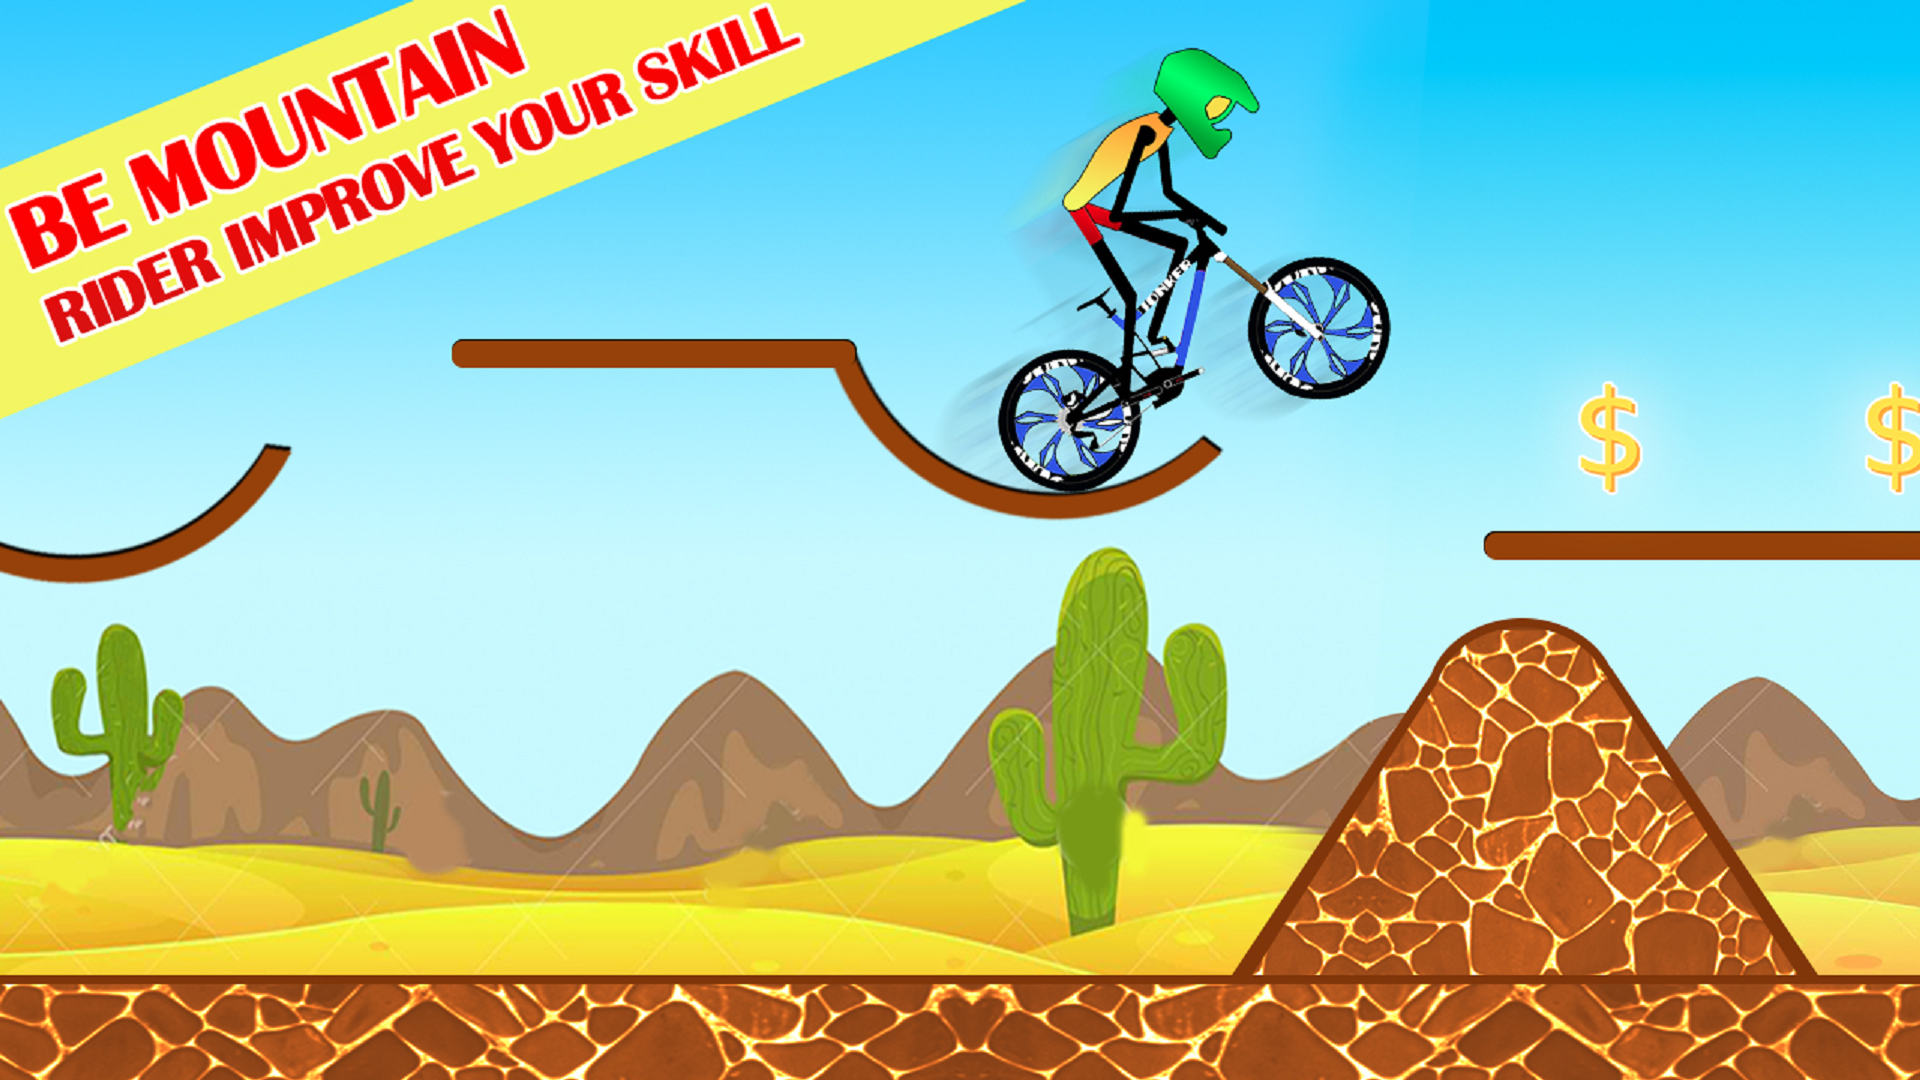 Carrera de montaña en bicicleta de montaña: Amazon.es: Appstore para Android